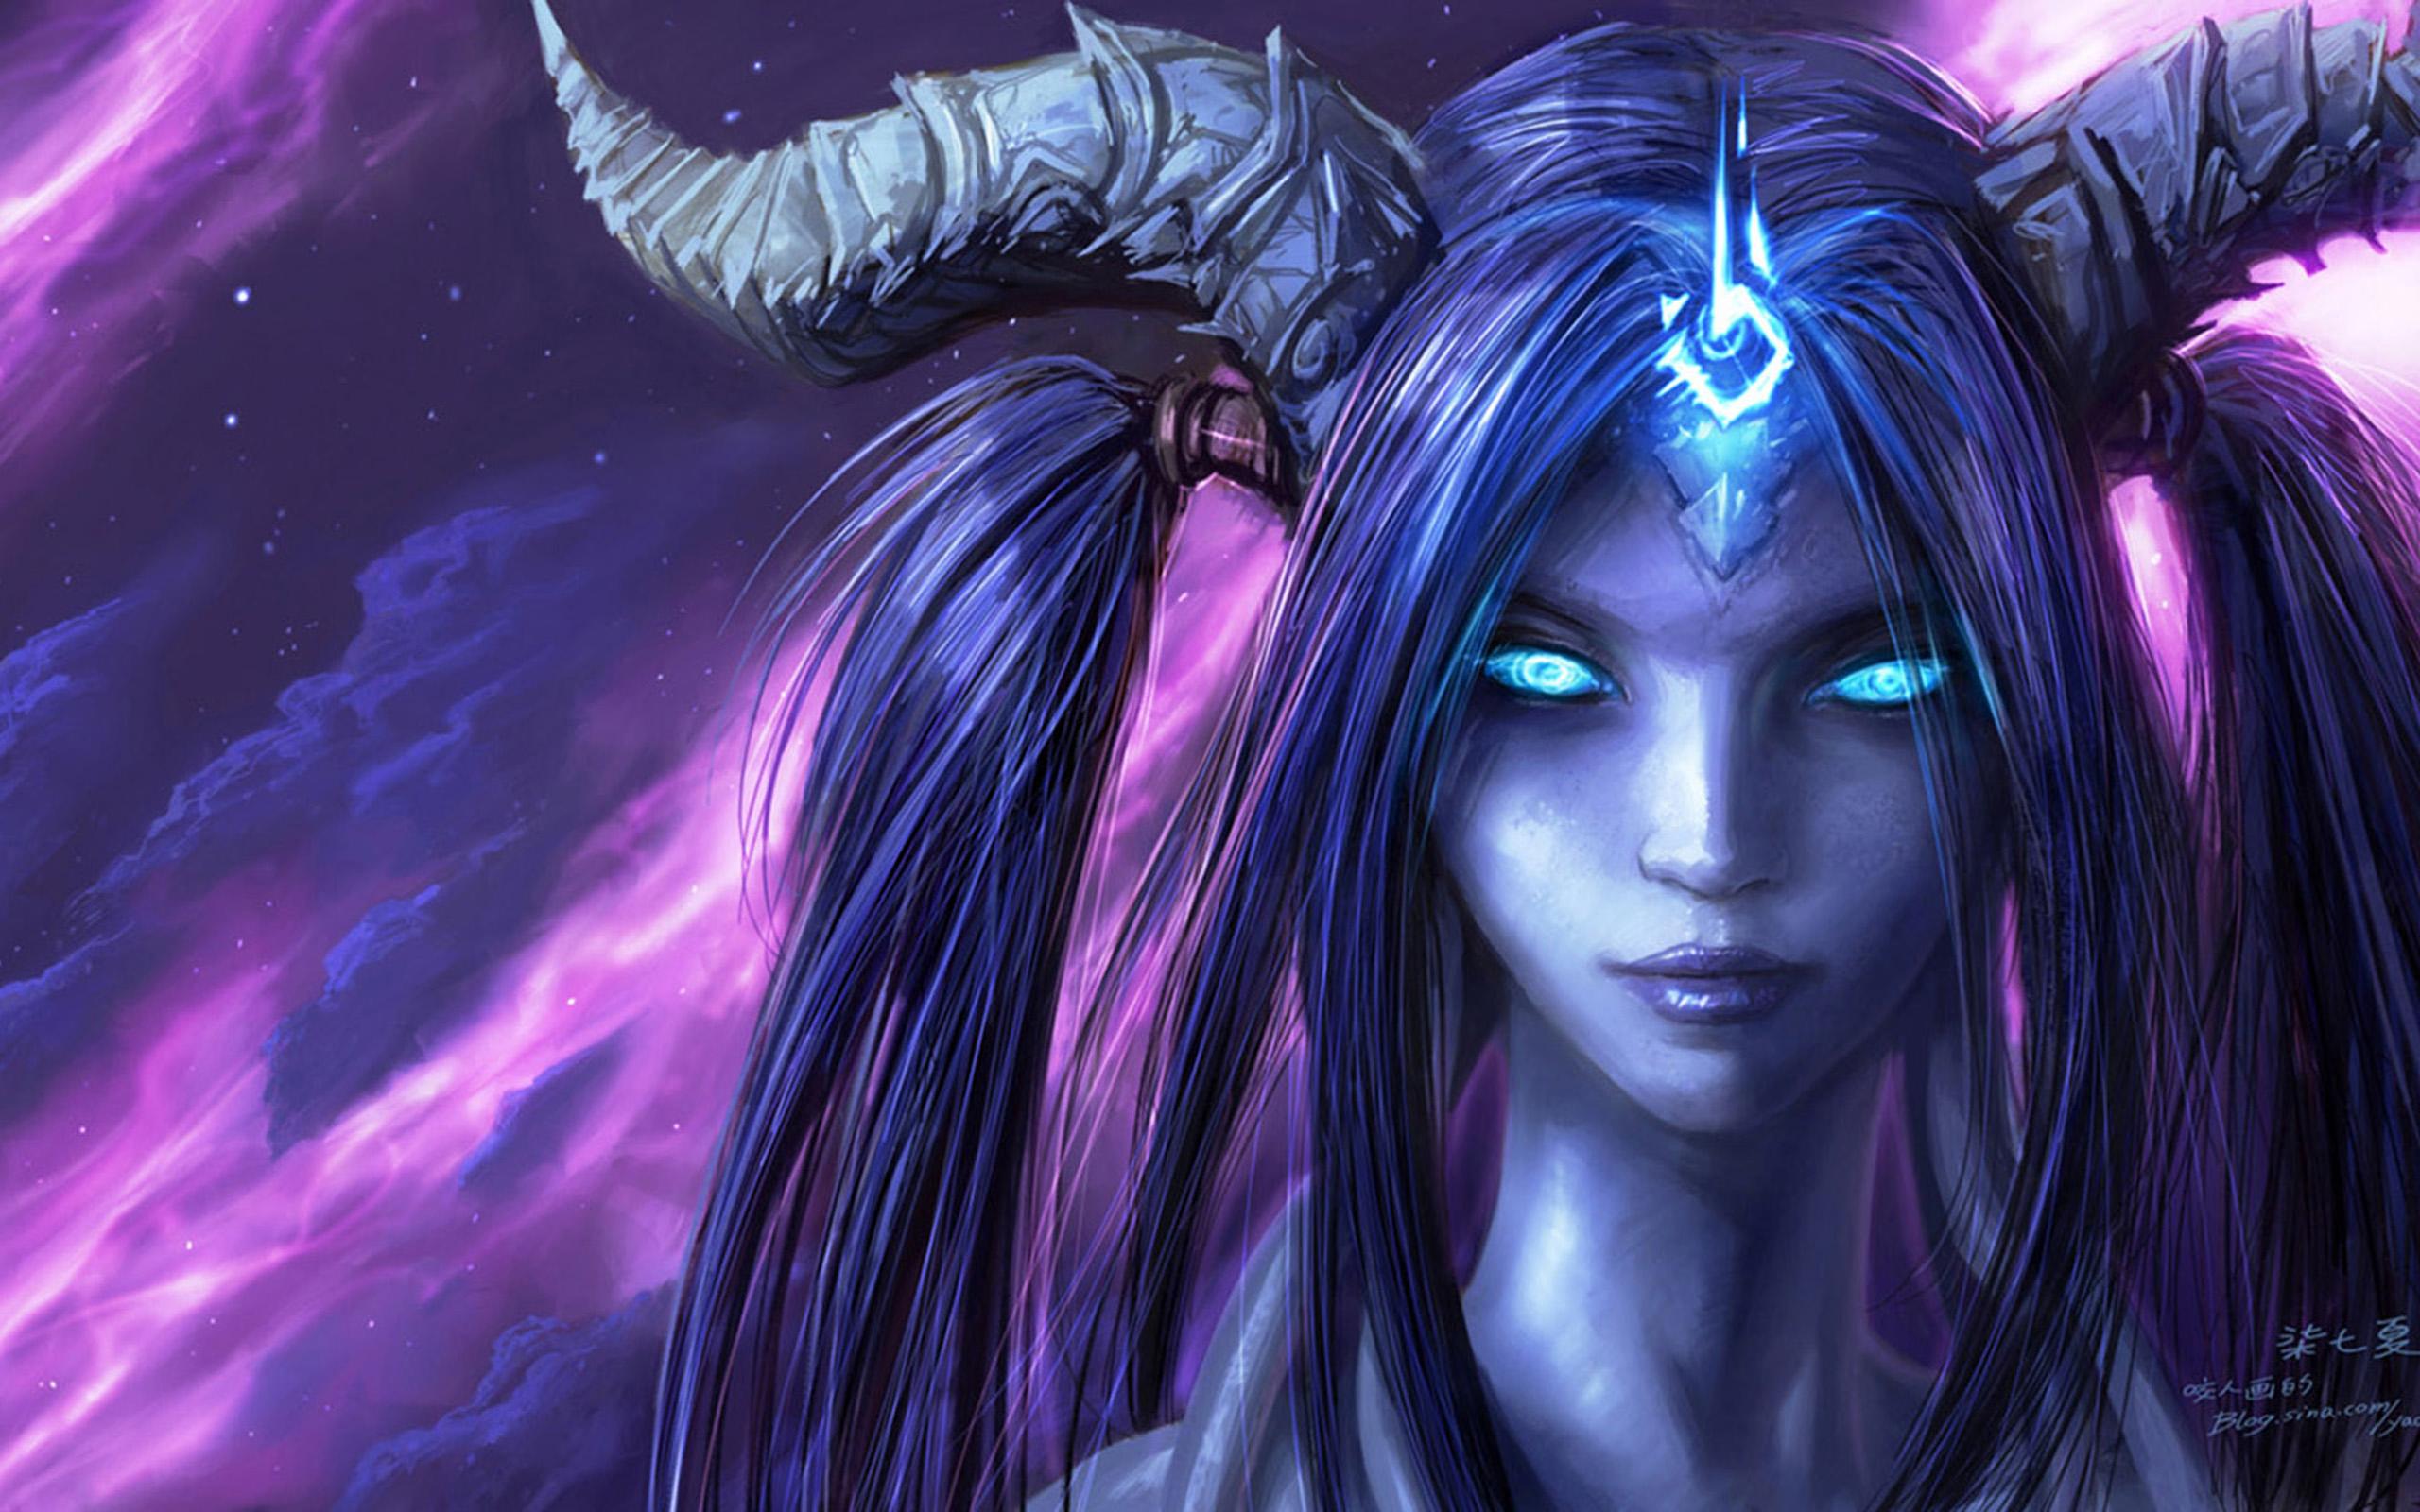 Anime Girl Angle Wallpaper 1366x768 World Of Warcraft Beauty Wallpapers Hd 2560x1600